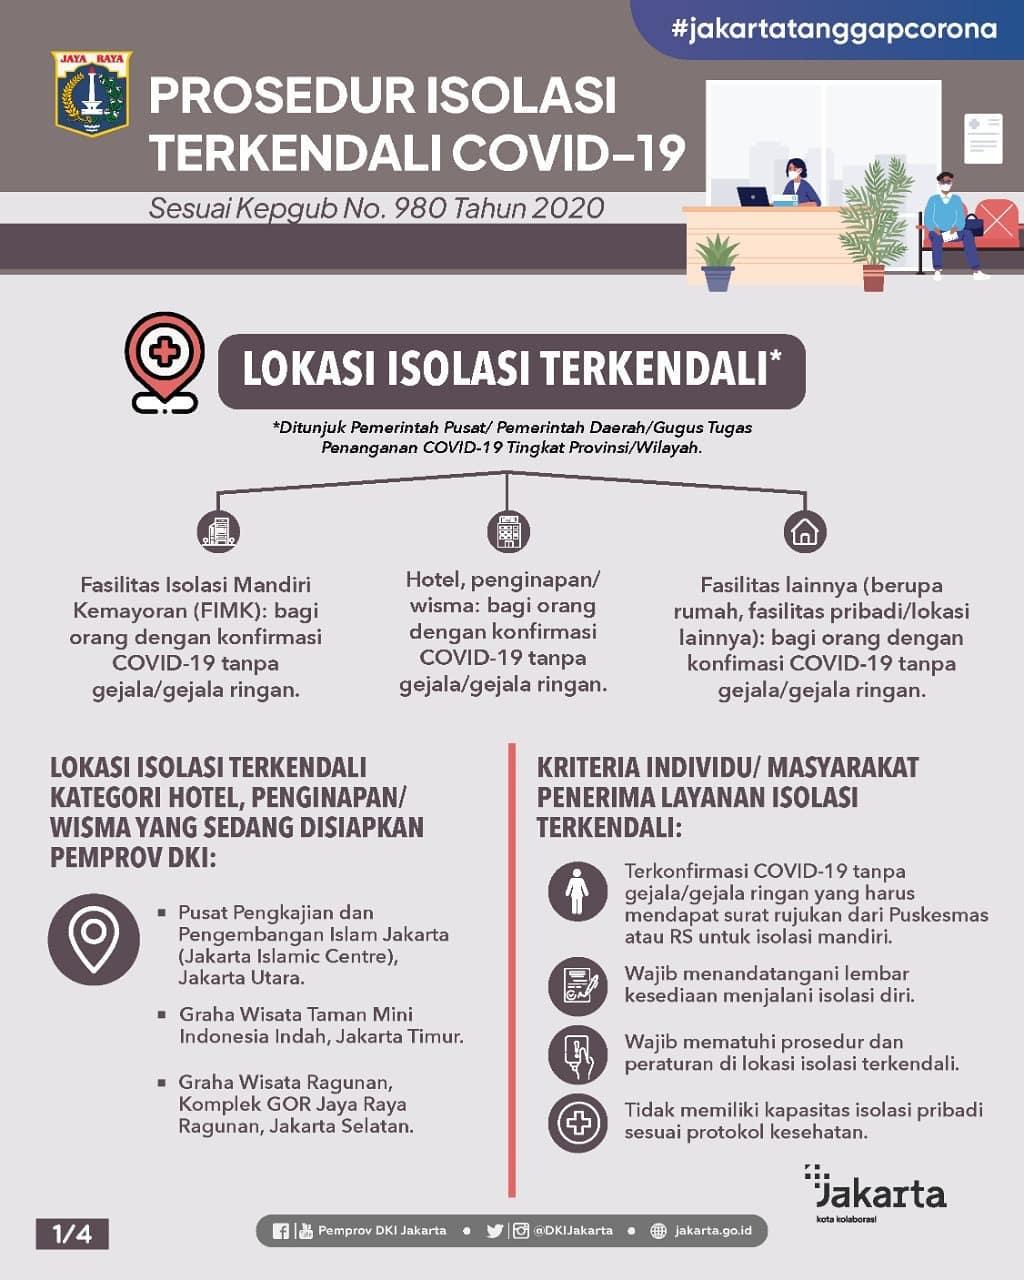 Prosedur Isolasi Terkendali COVID-19-Slide_1